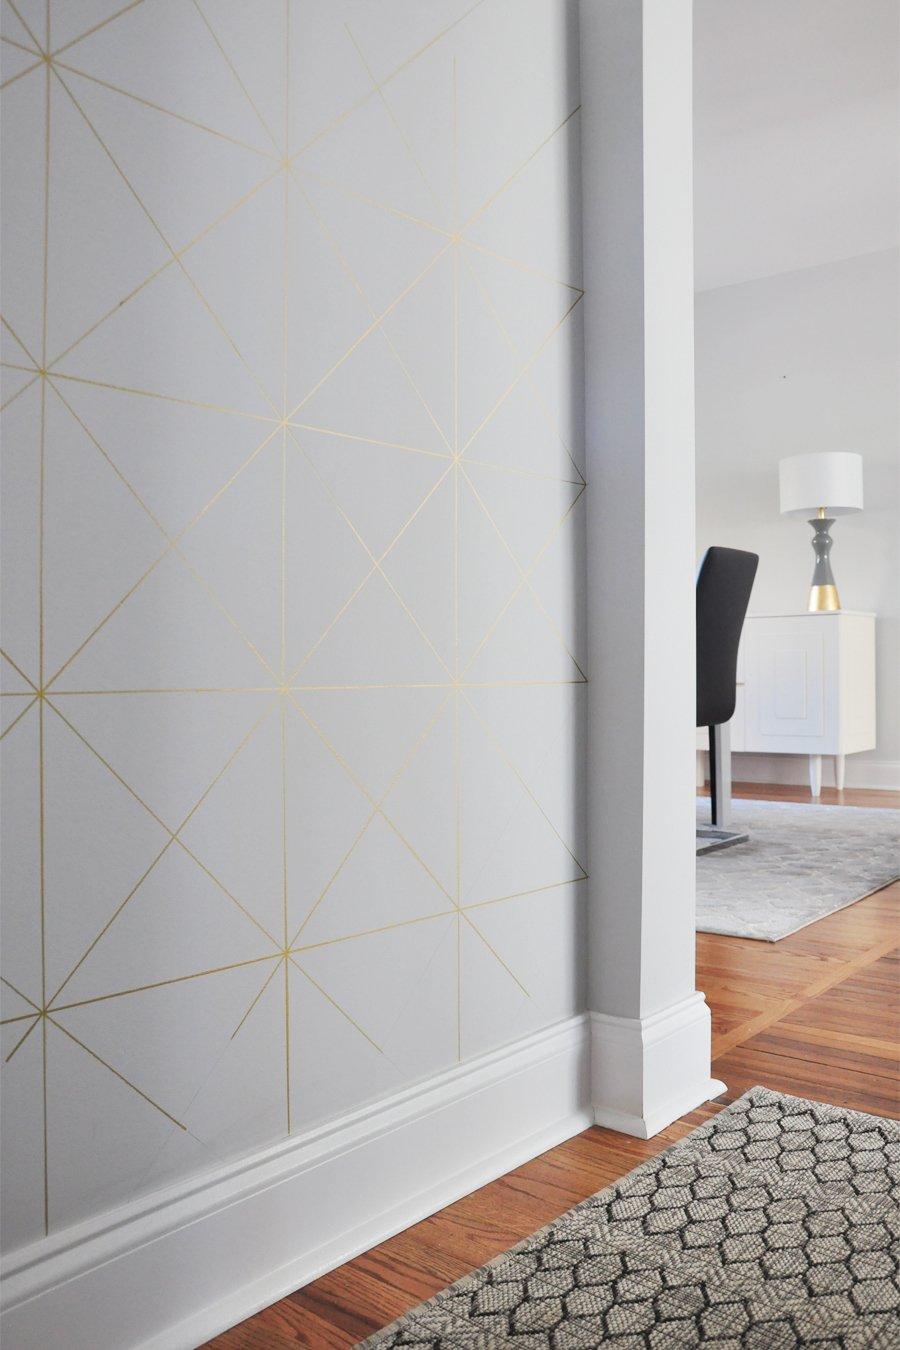 Fall 2017 One Room Challenge Week 3 DIY Gold Sharpie Wall